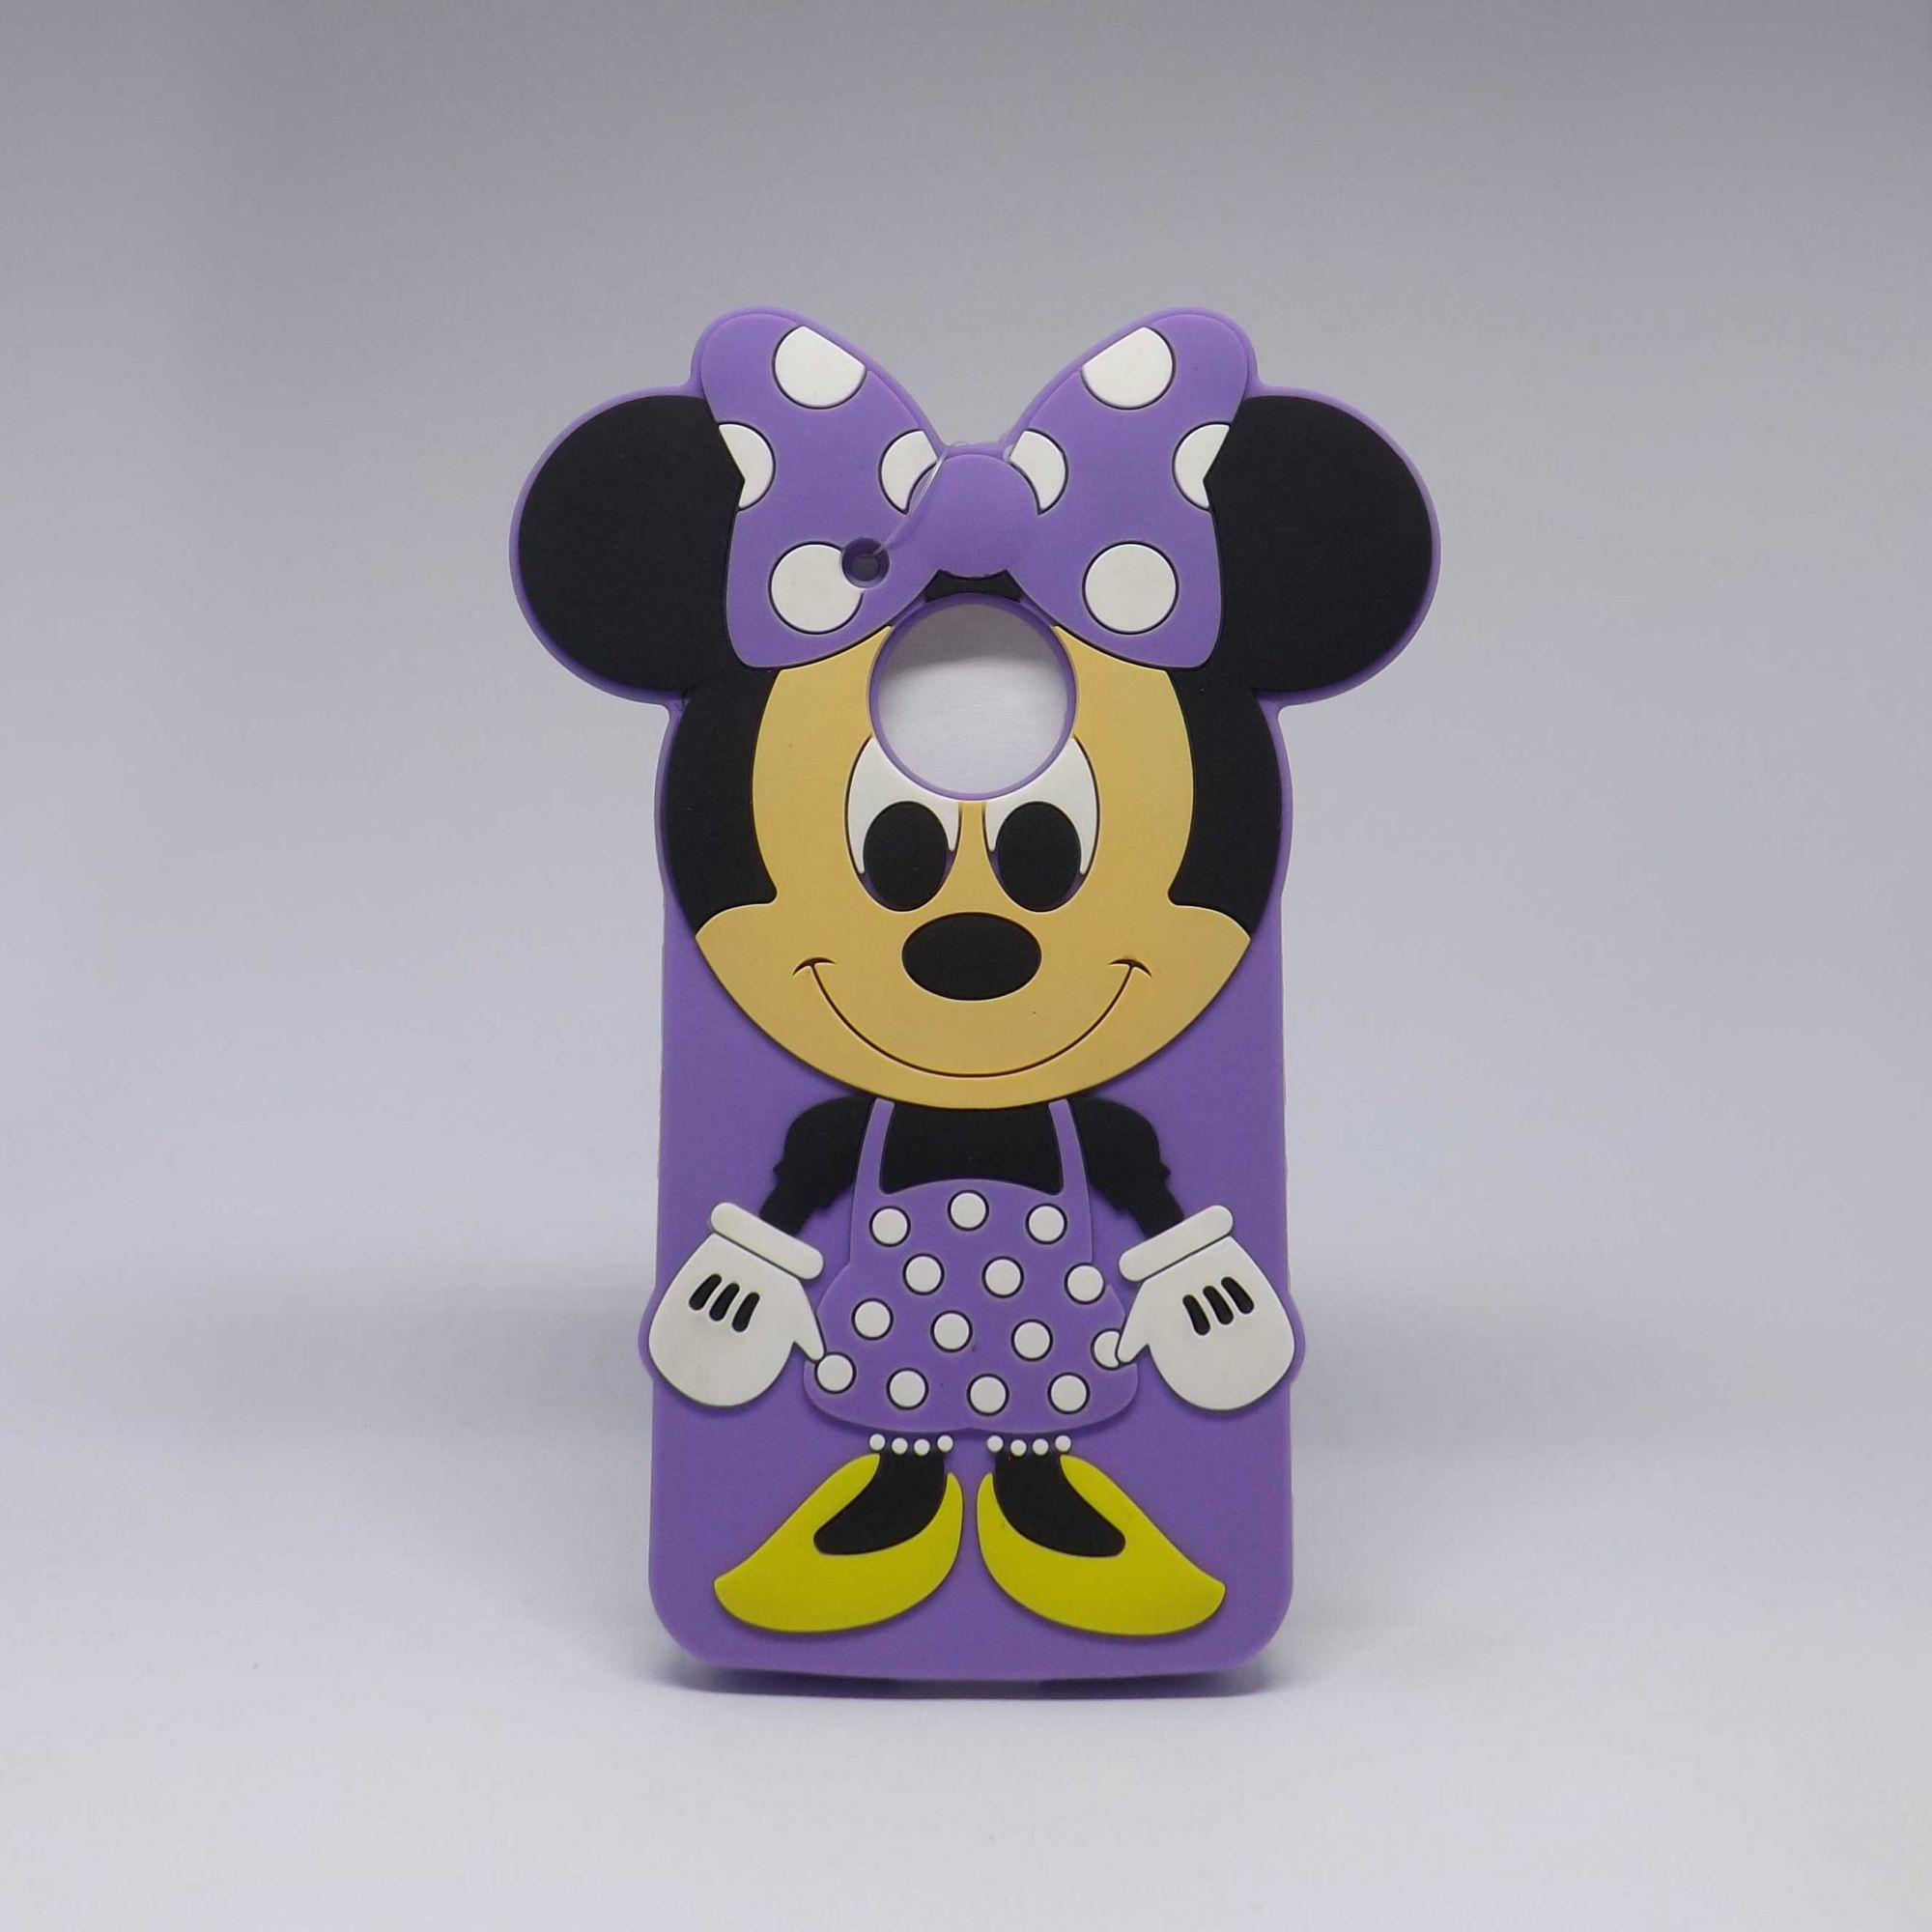 Capa Motorola G5 Personagens - Minnie